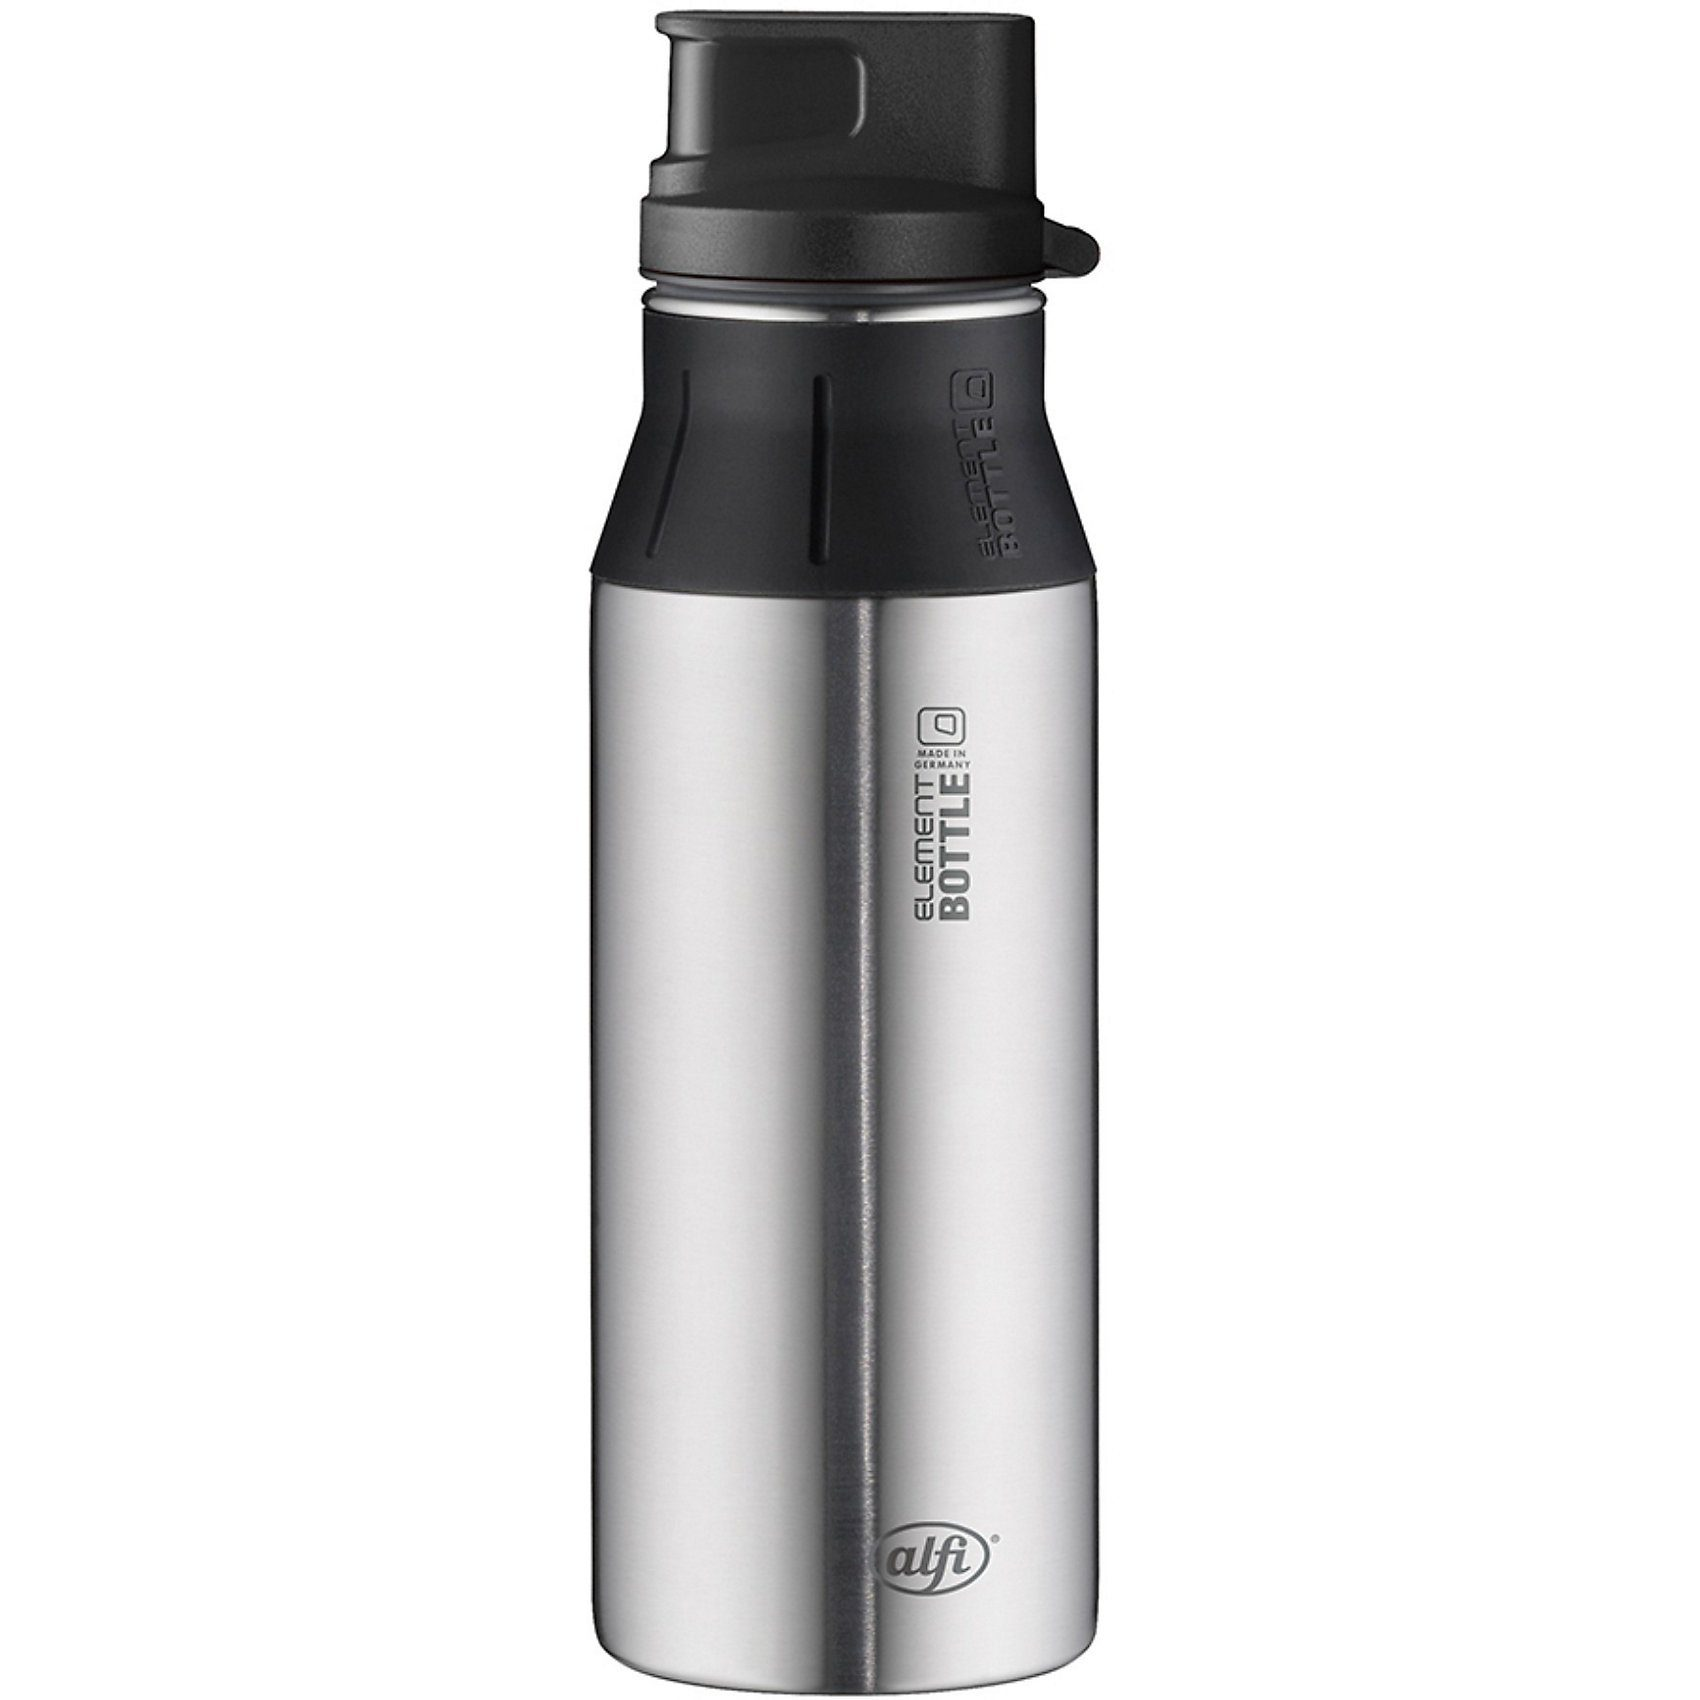 Alfi Trinkflasche elementBottle Pure Edelstahl, 600 ml